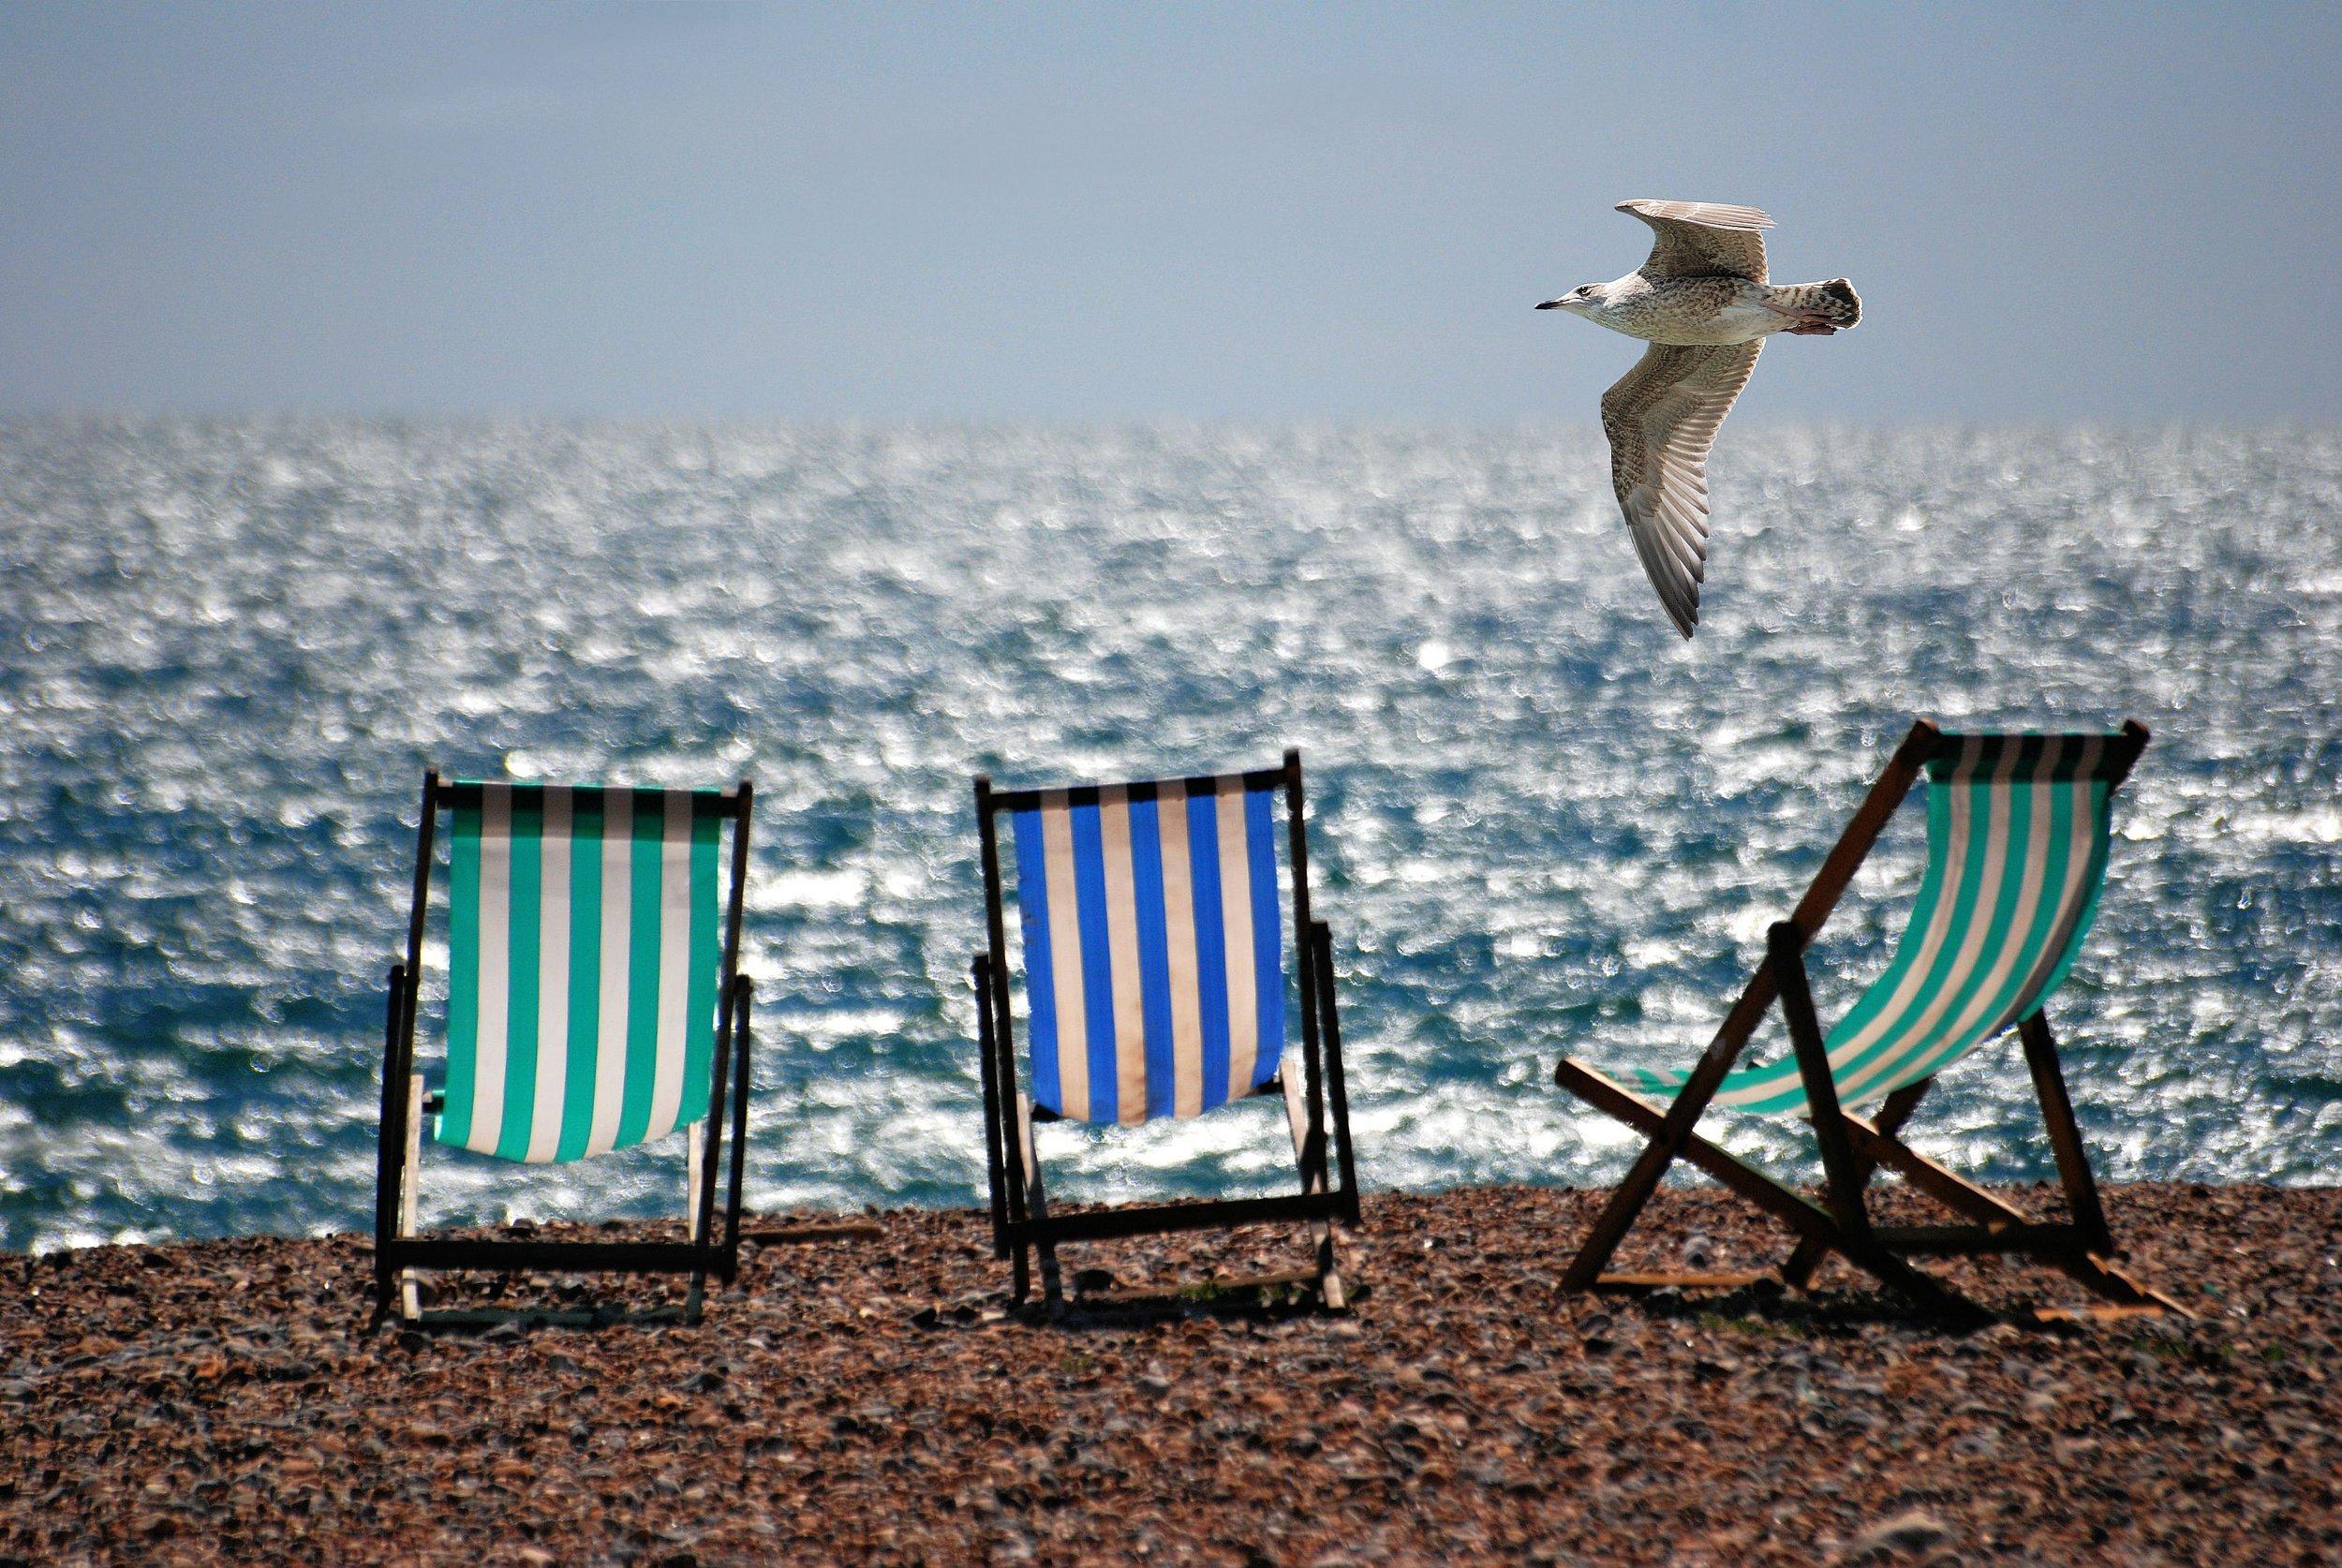 deckchairs-sea-beach-seaside-54104.jpeg